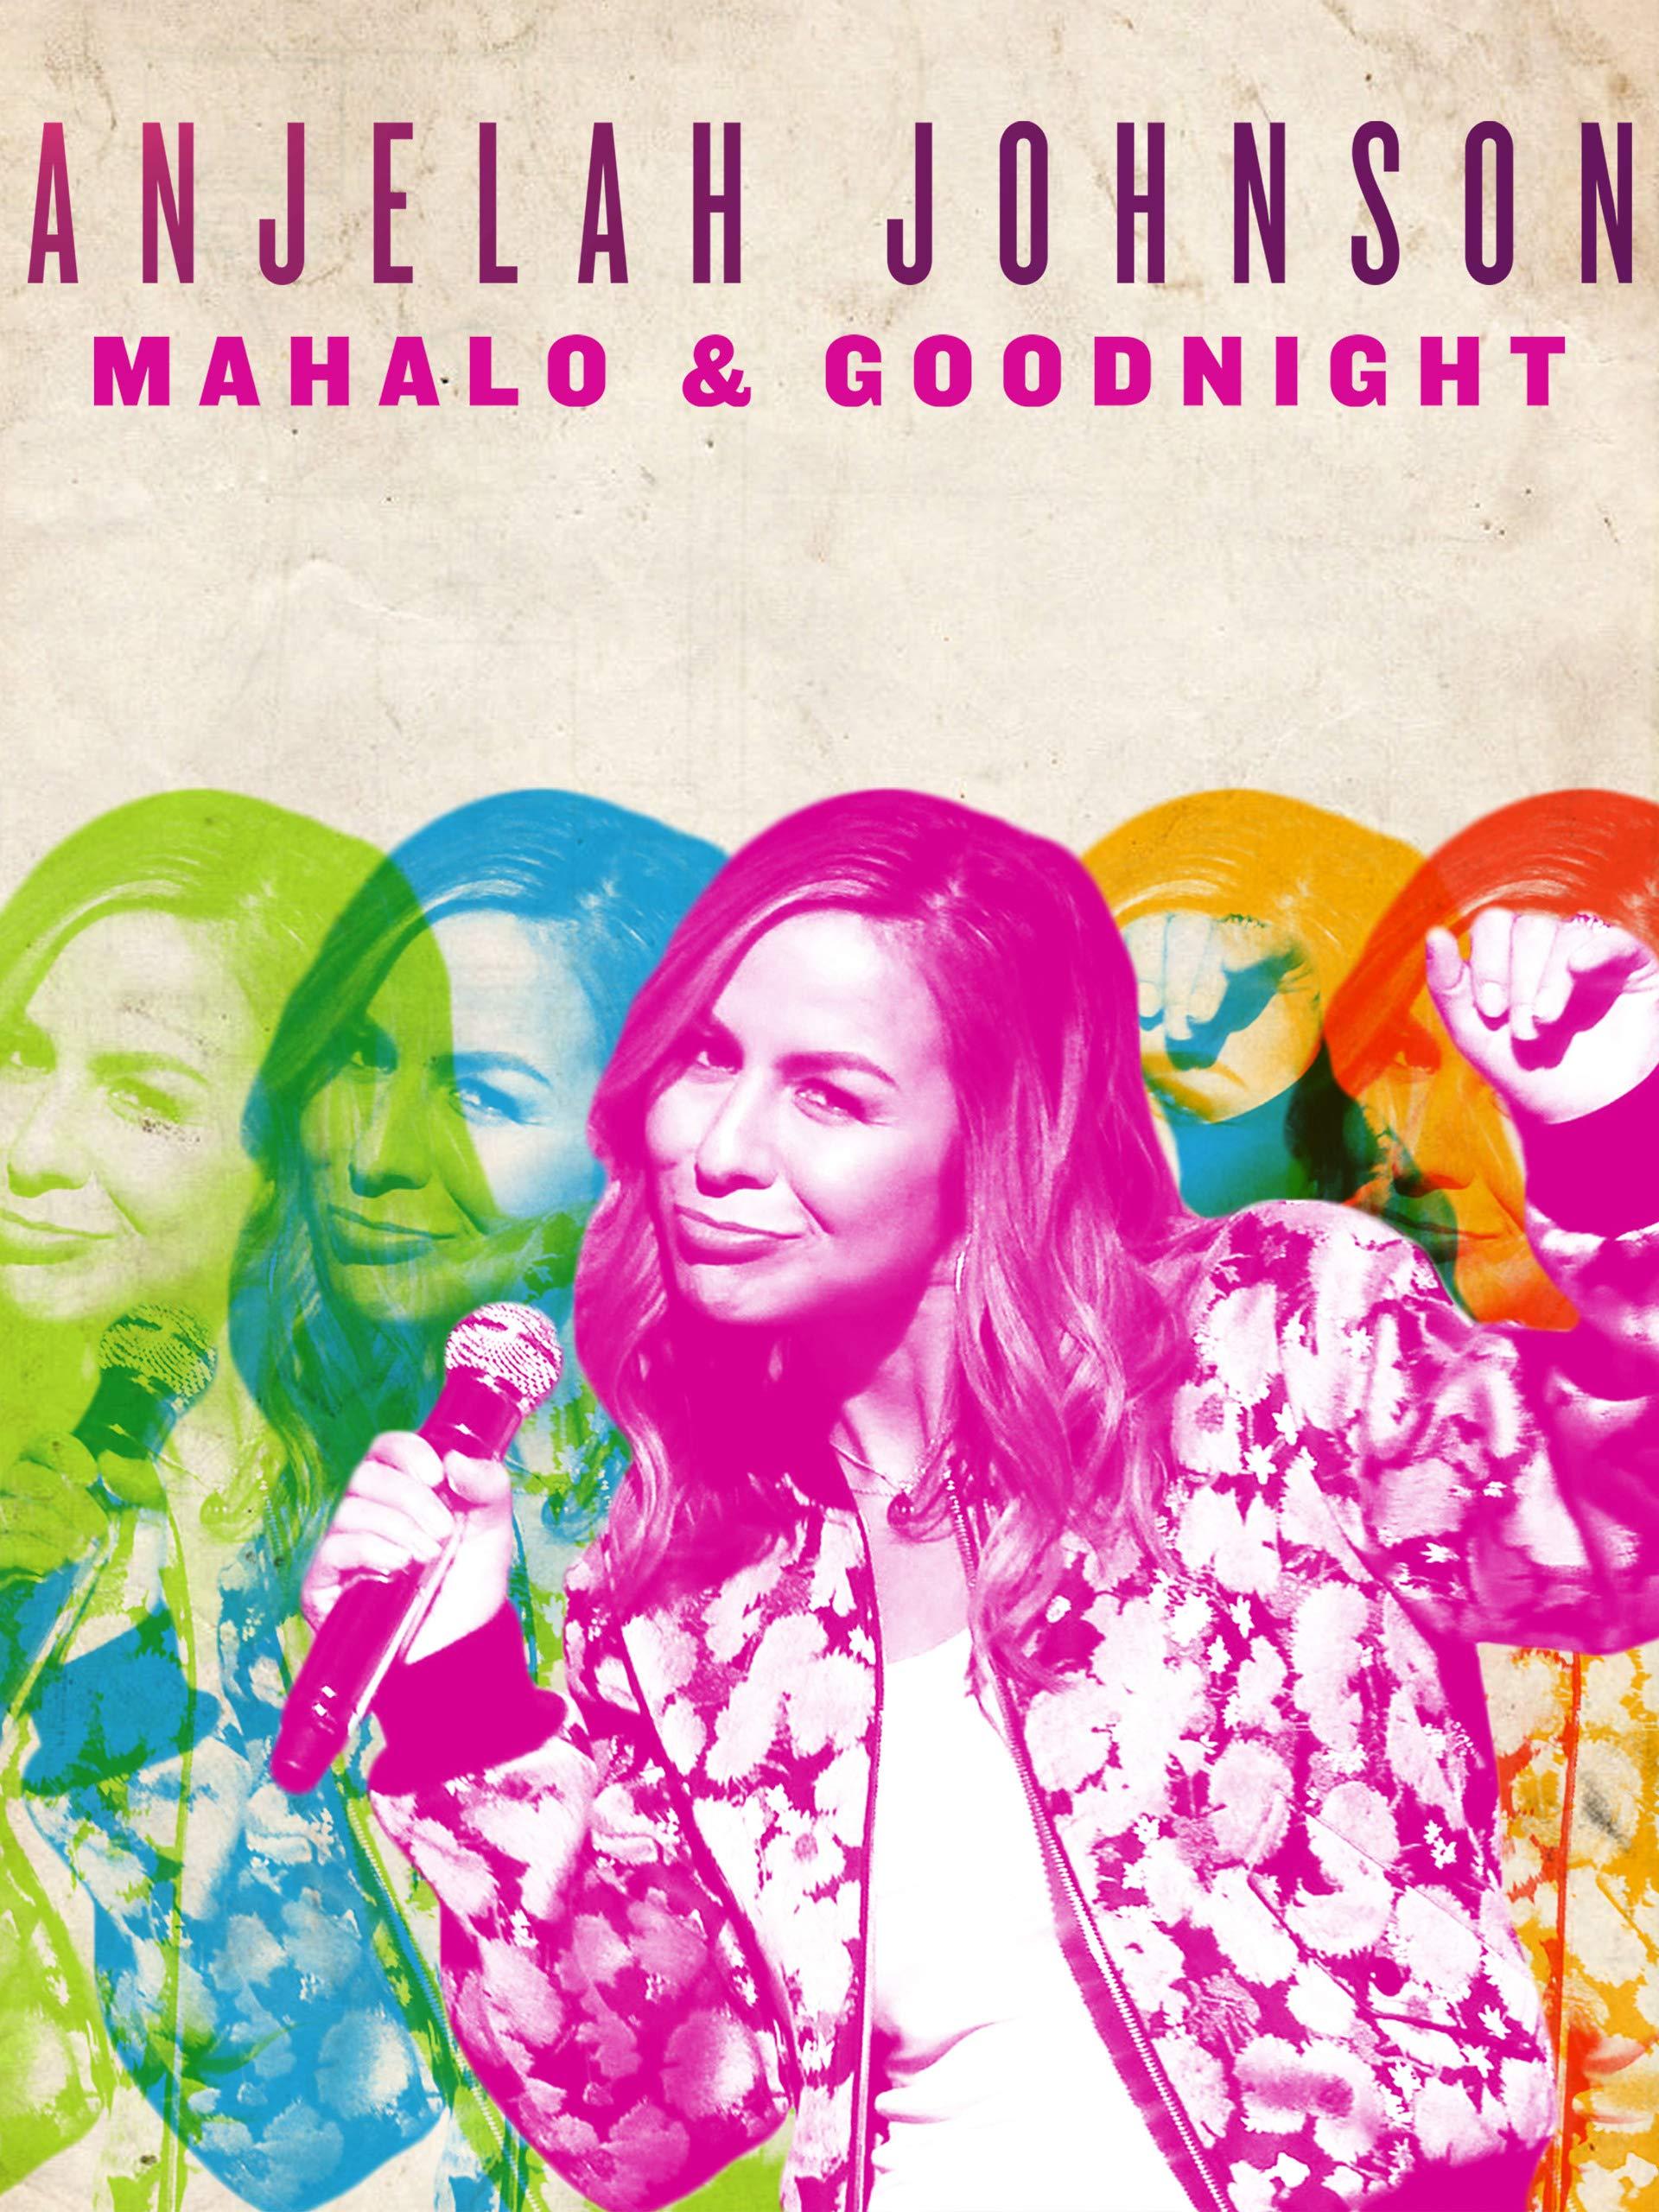 Anjelah Johnson: Mahalo & Goodnight on Amazon Prime Video UK